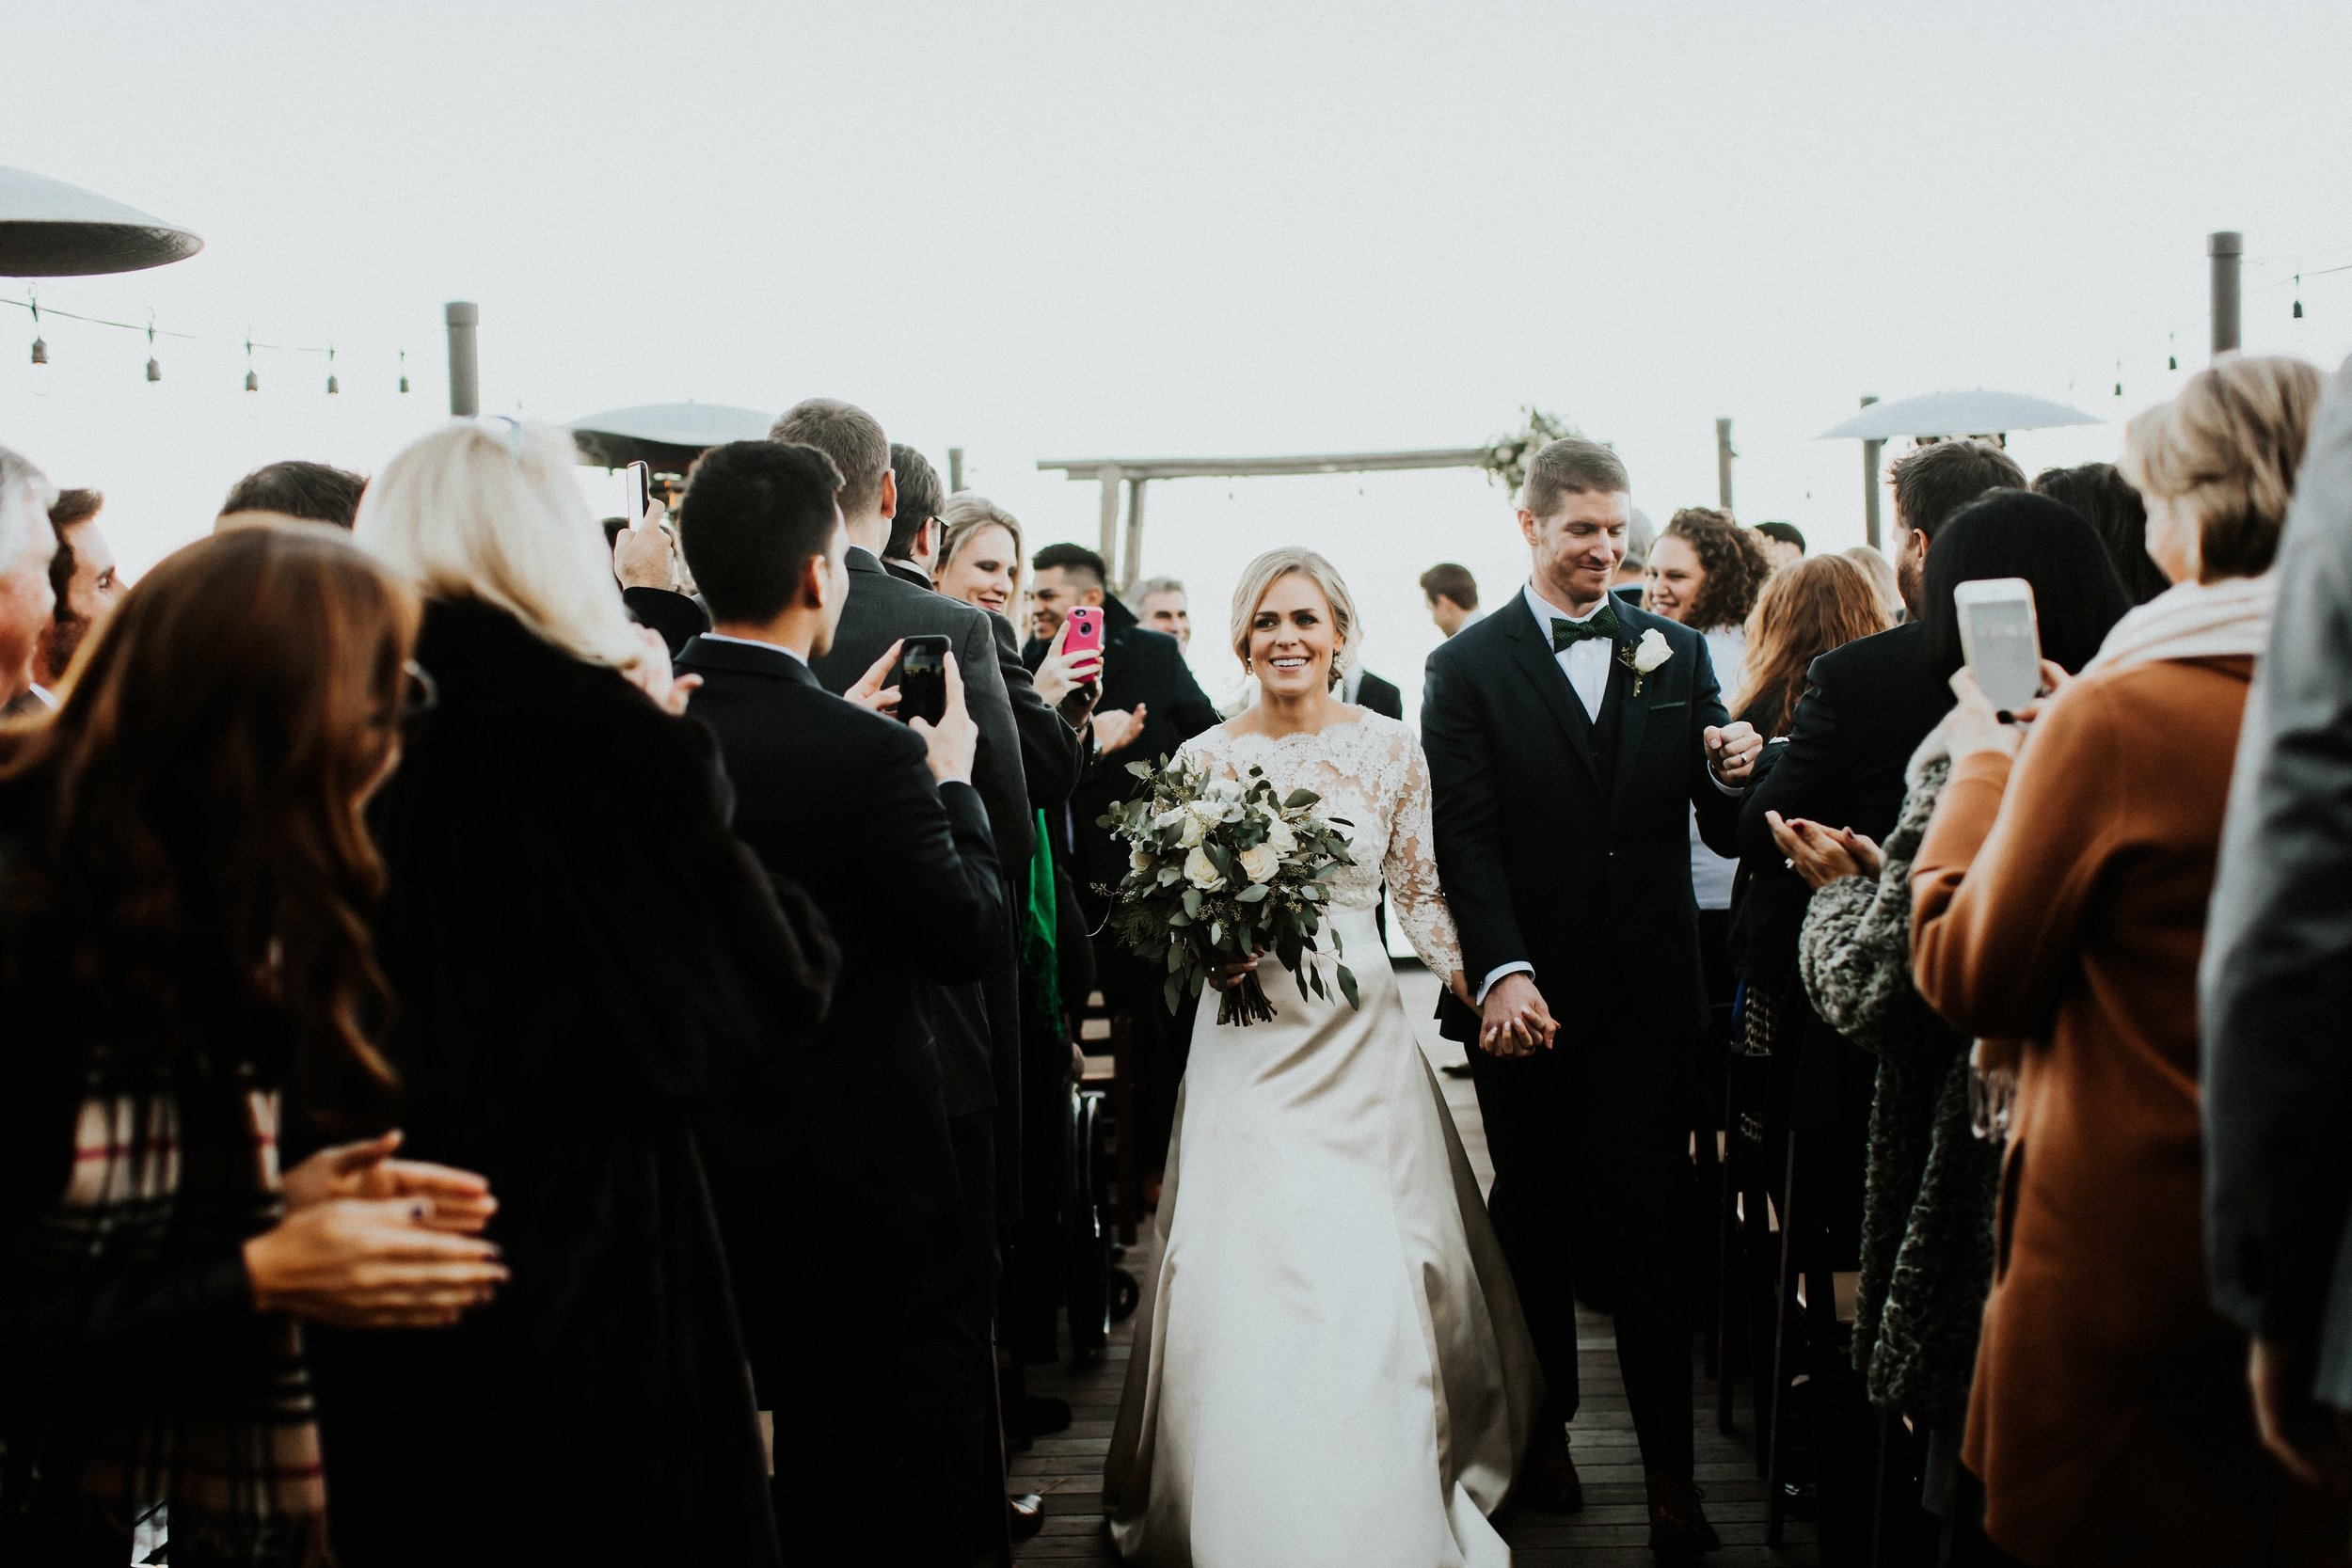 sarah+brenden-ceremony-137.jpg